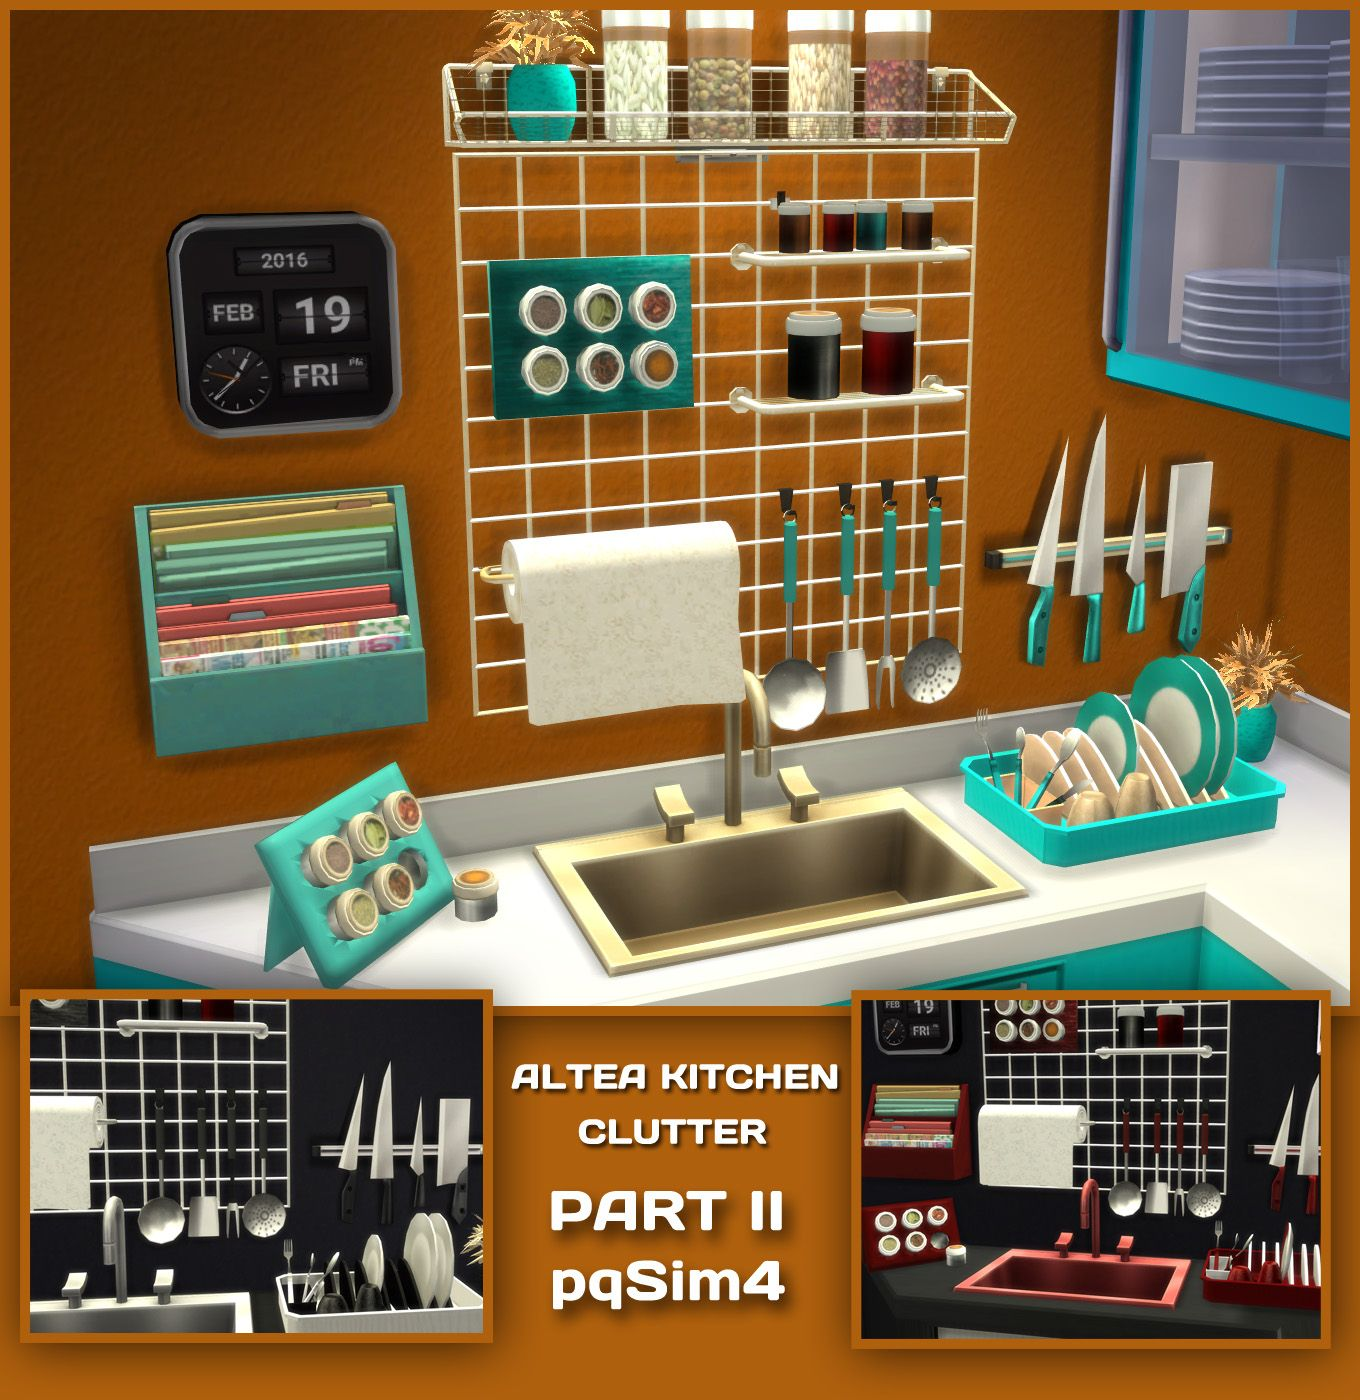 Altea Kitchen Clutter Part 2. Sims 4 Custom Content.